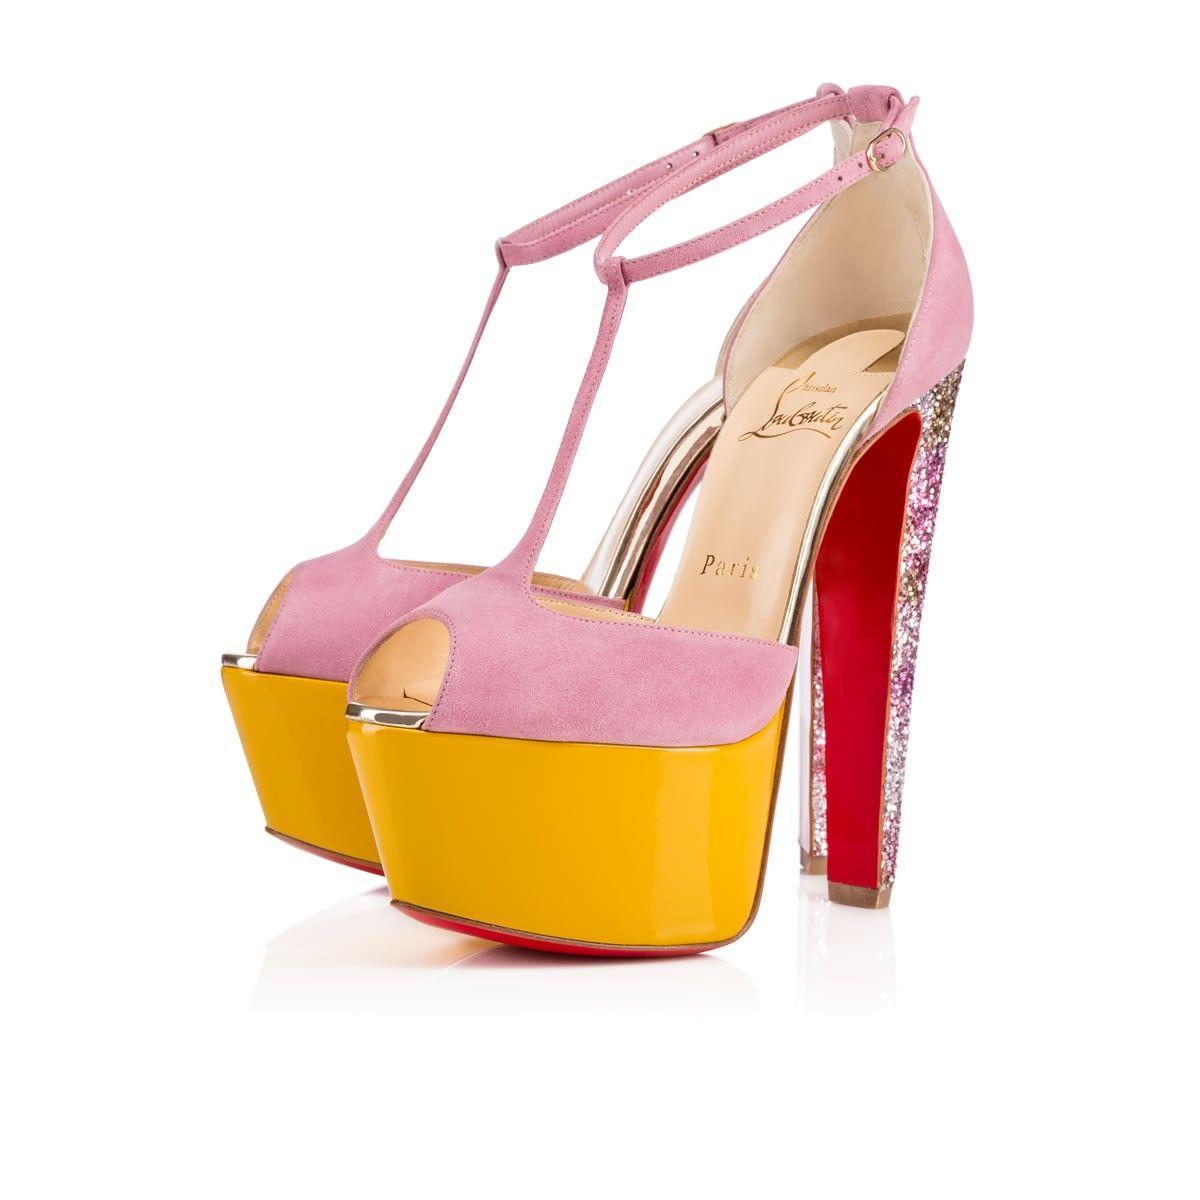 NENECHERITZA SUEDE/SPECCIO, ROSETTE, Glitter, Women Shoes, Louboutin. 845€